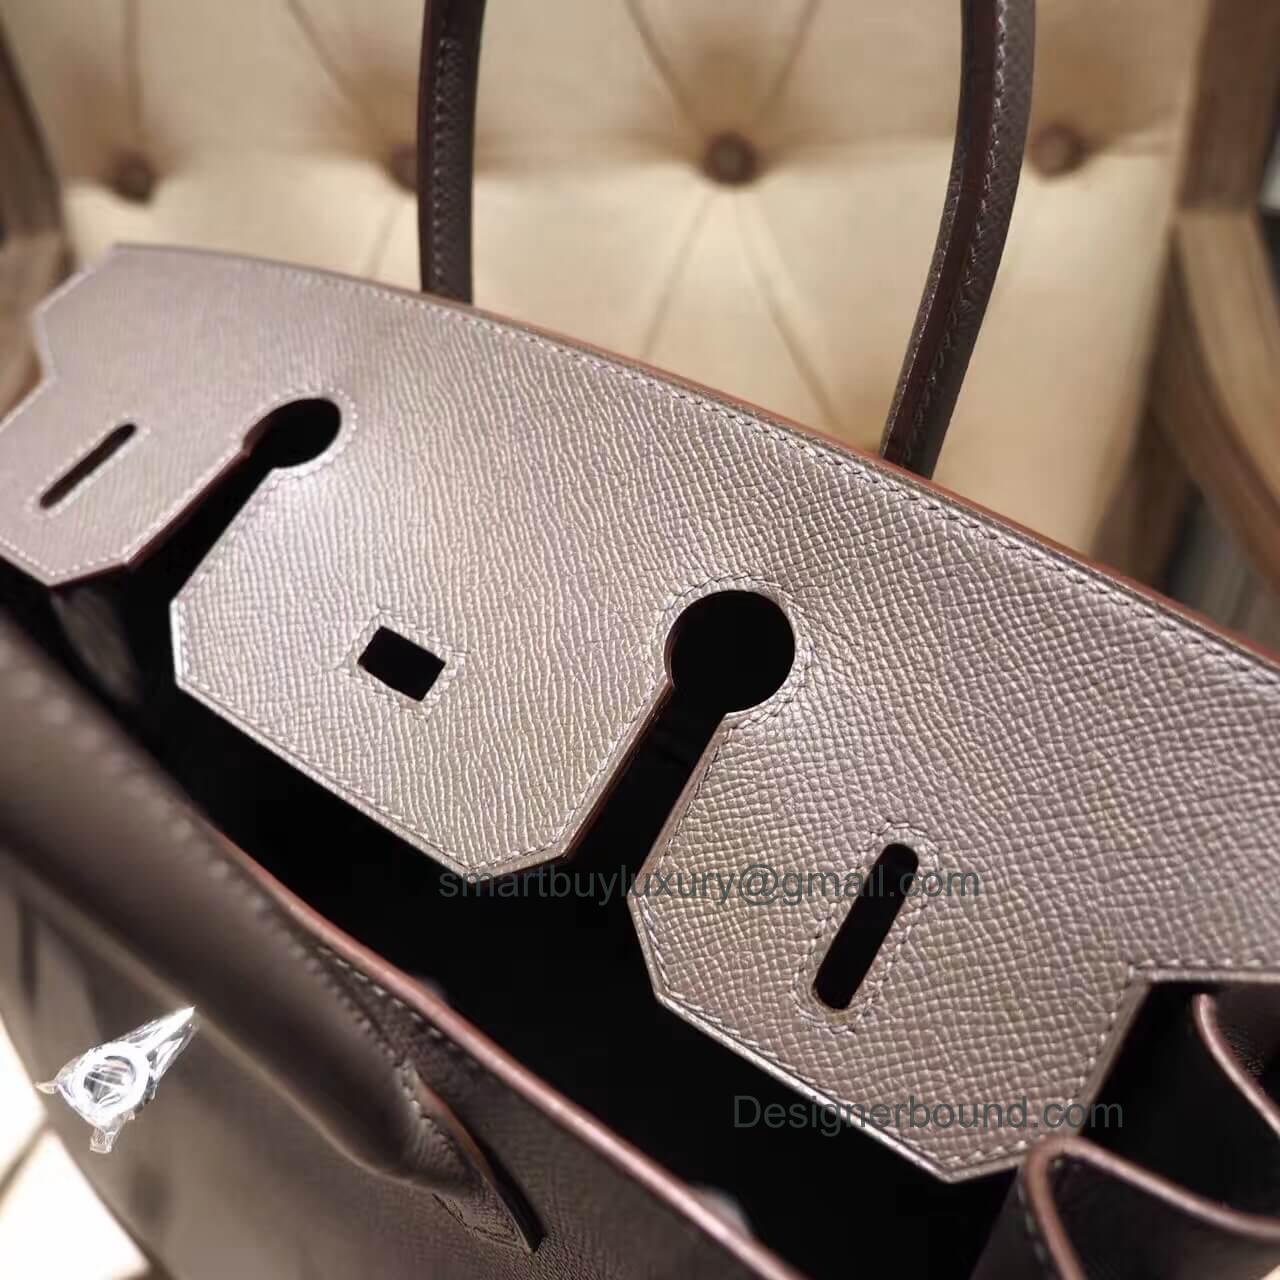 8ff0bbffb916 Hermes Birkin 30 Handbag in 8f Etain Epsom GHW - Hermes Replica